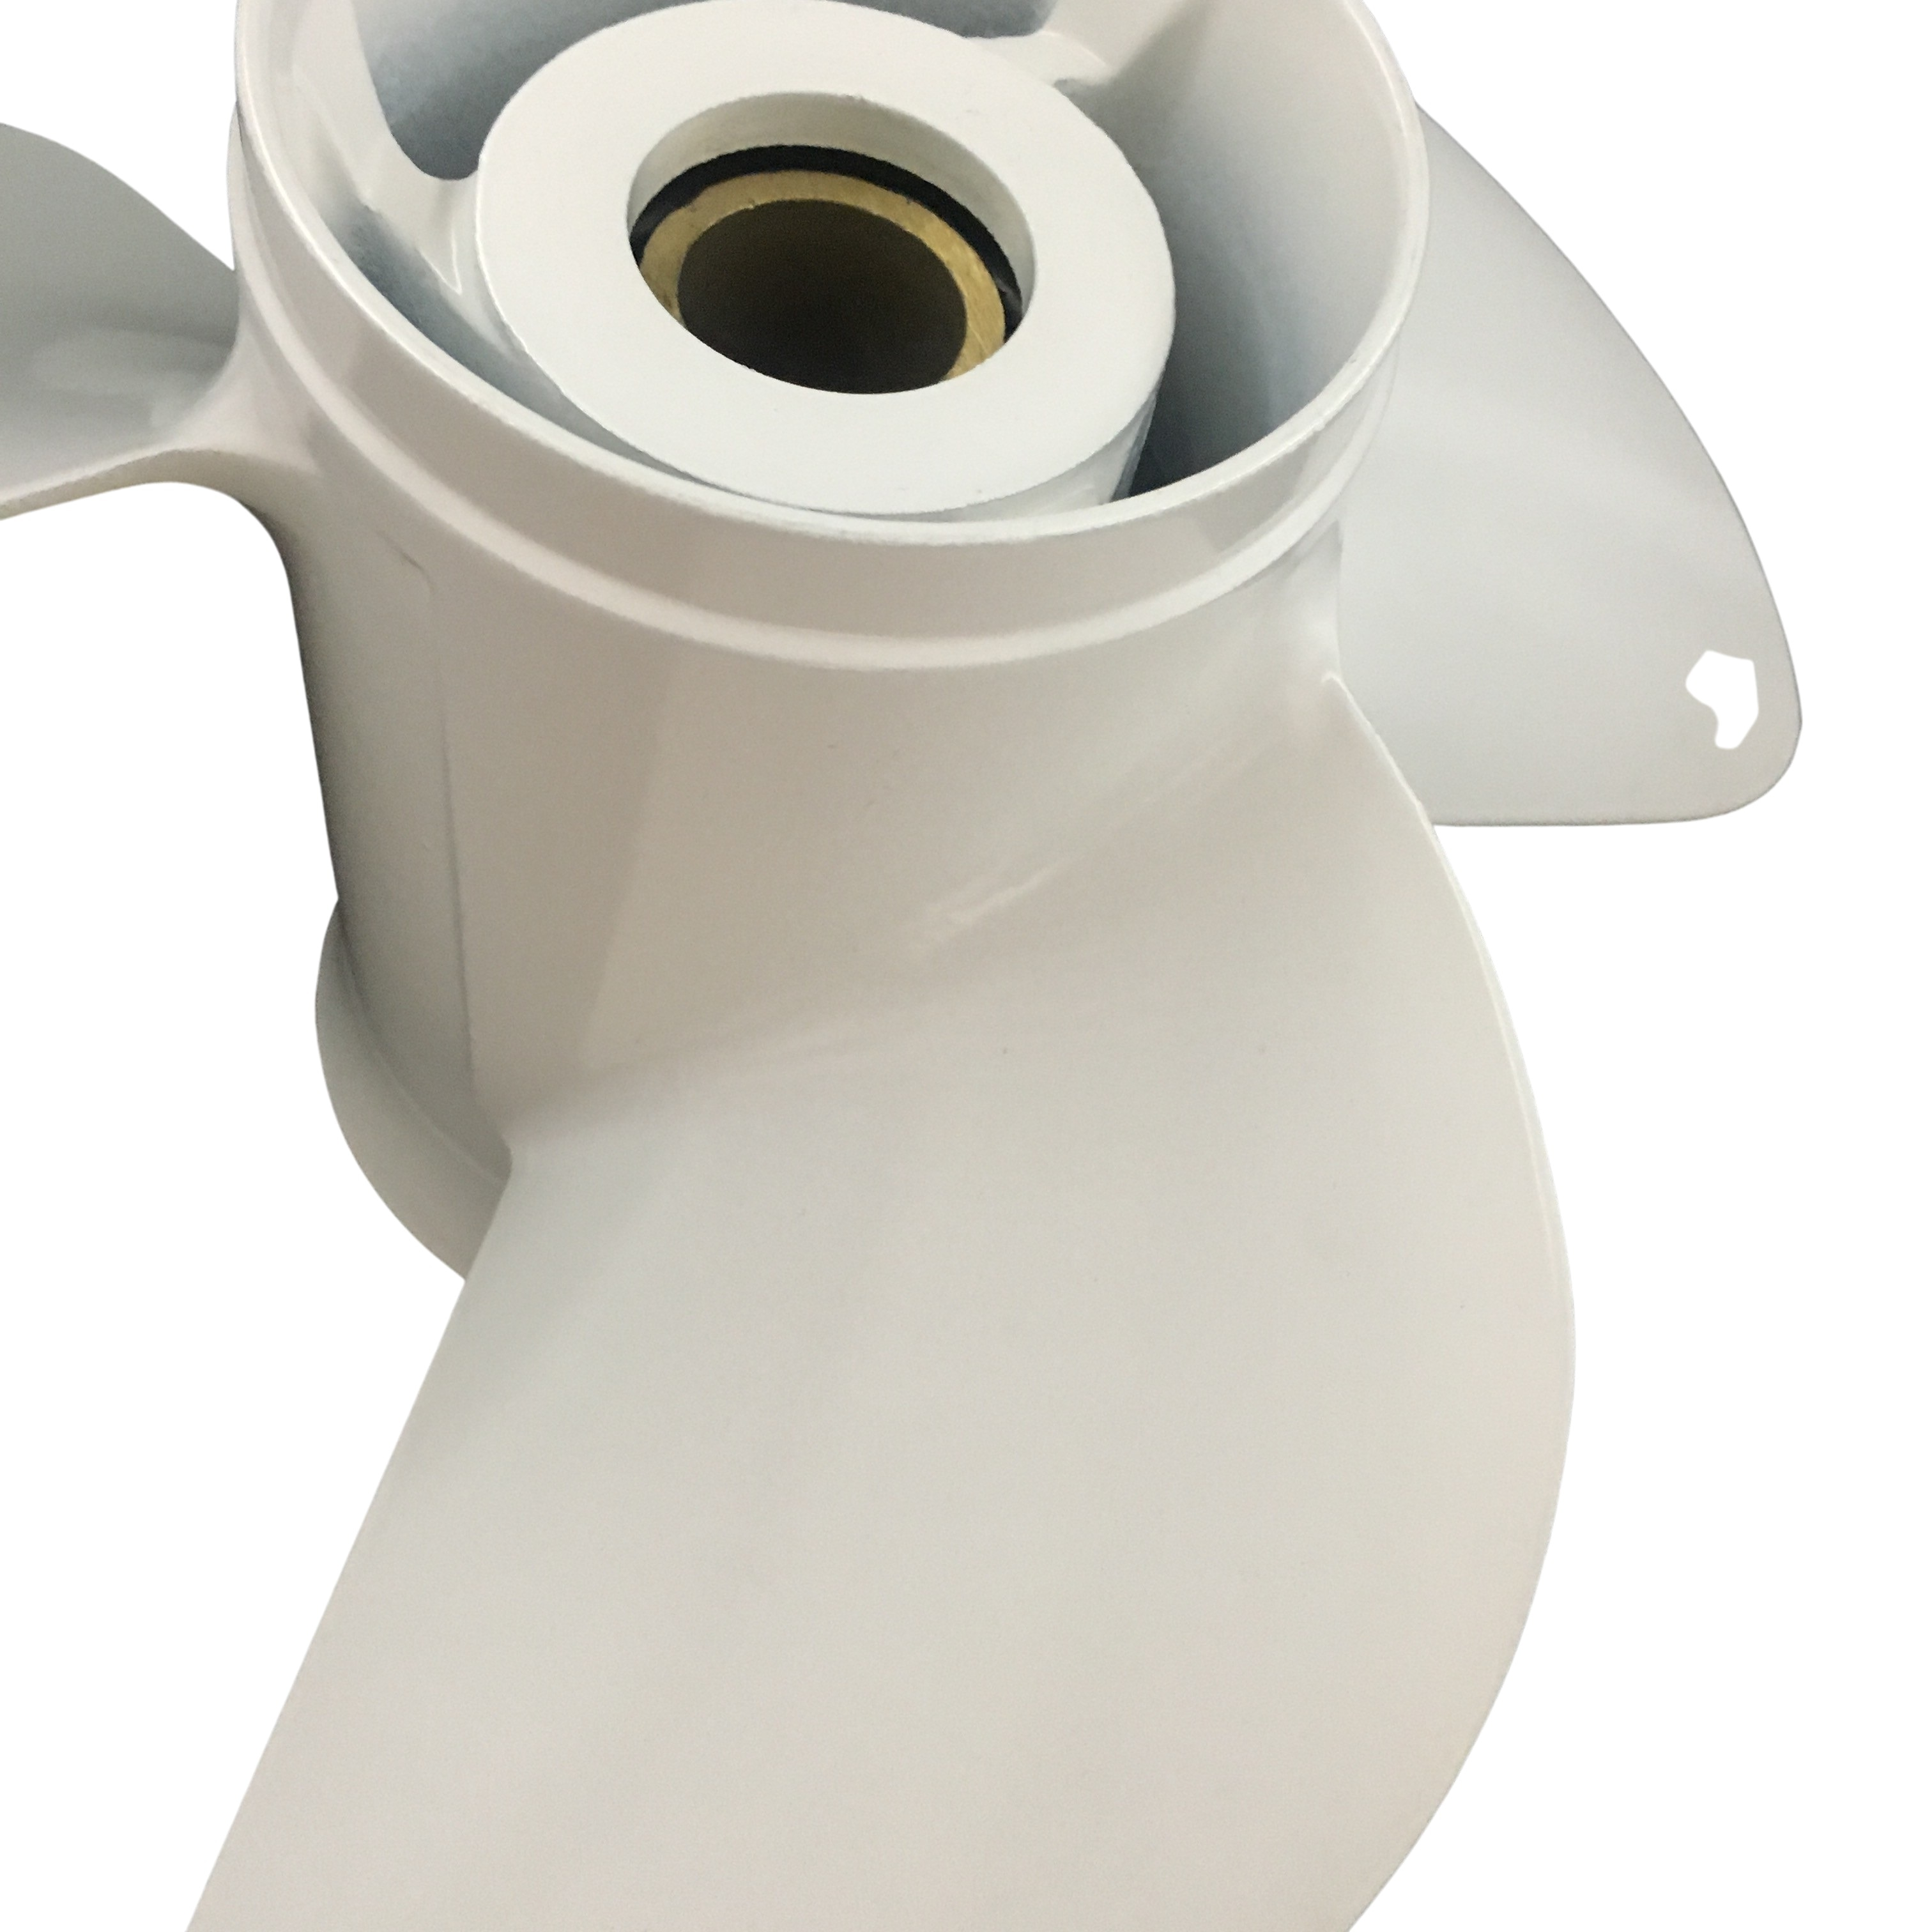 Boat propeller suit for Yamaha 13 1 4x17 aluminum prop 3 blade 15 tooth RH OEM No: 6E5-45945-01-EL enlarge